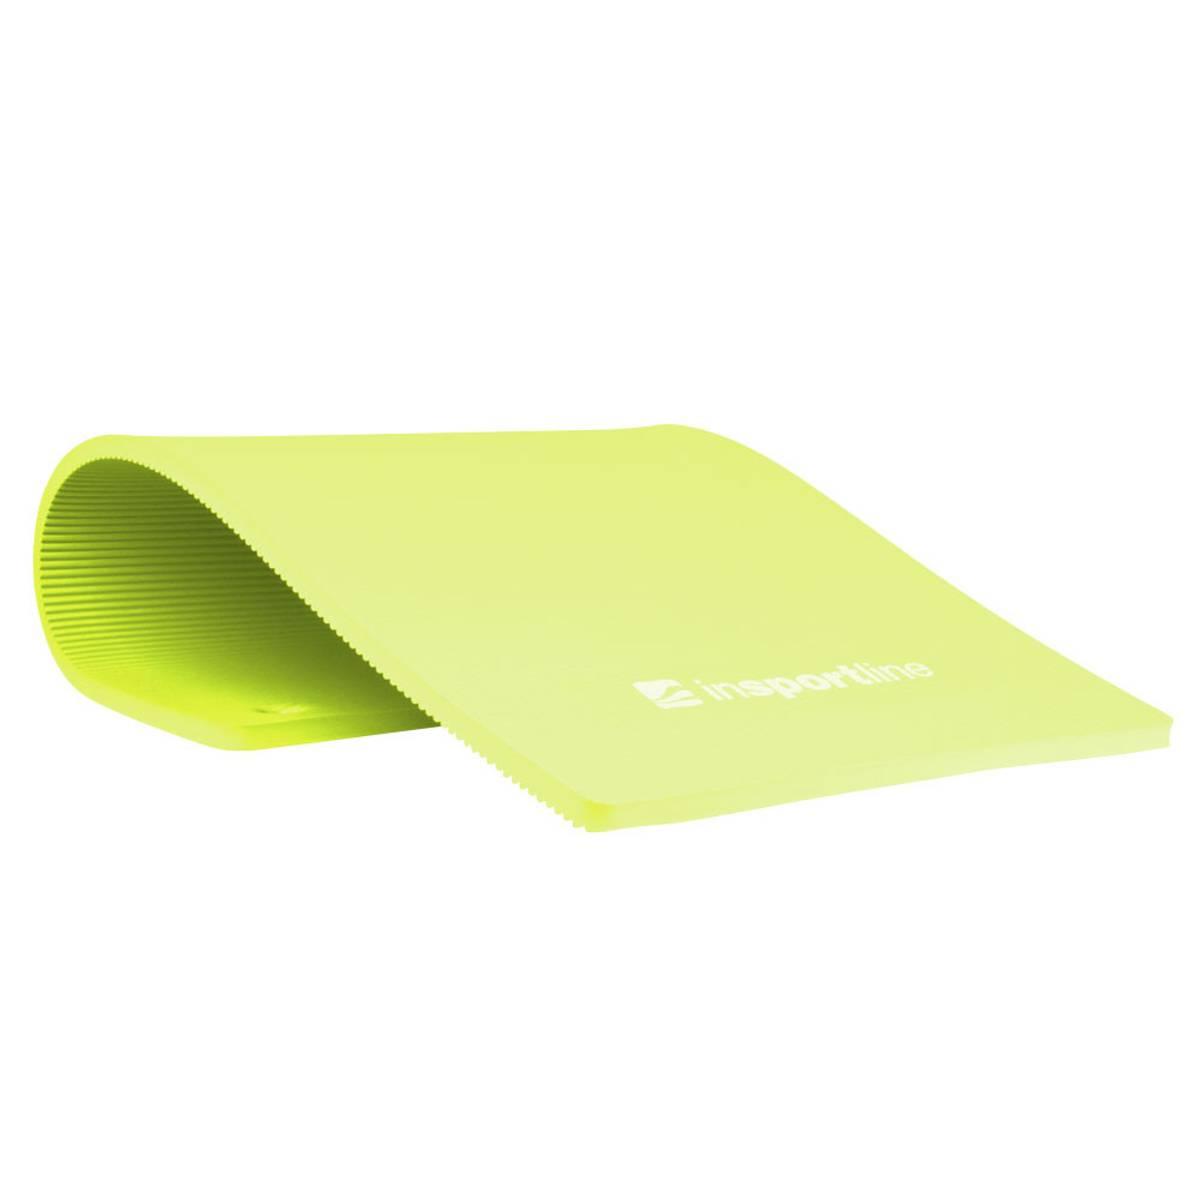 Treningsmatte inSPORTline Profi 100 cm - Grønn